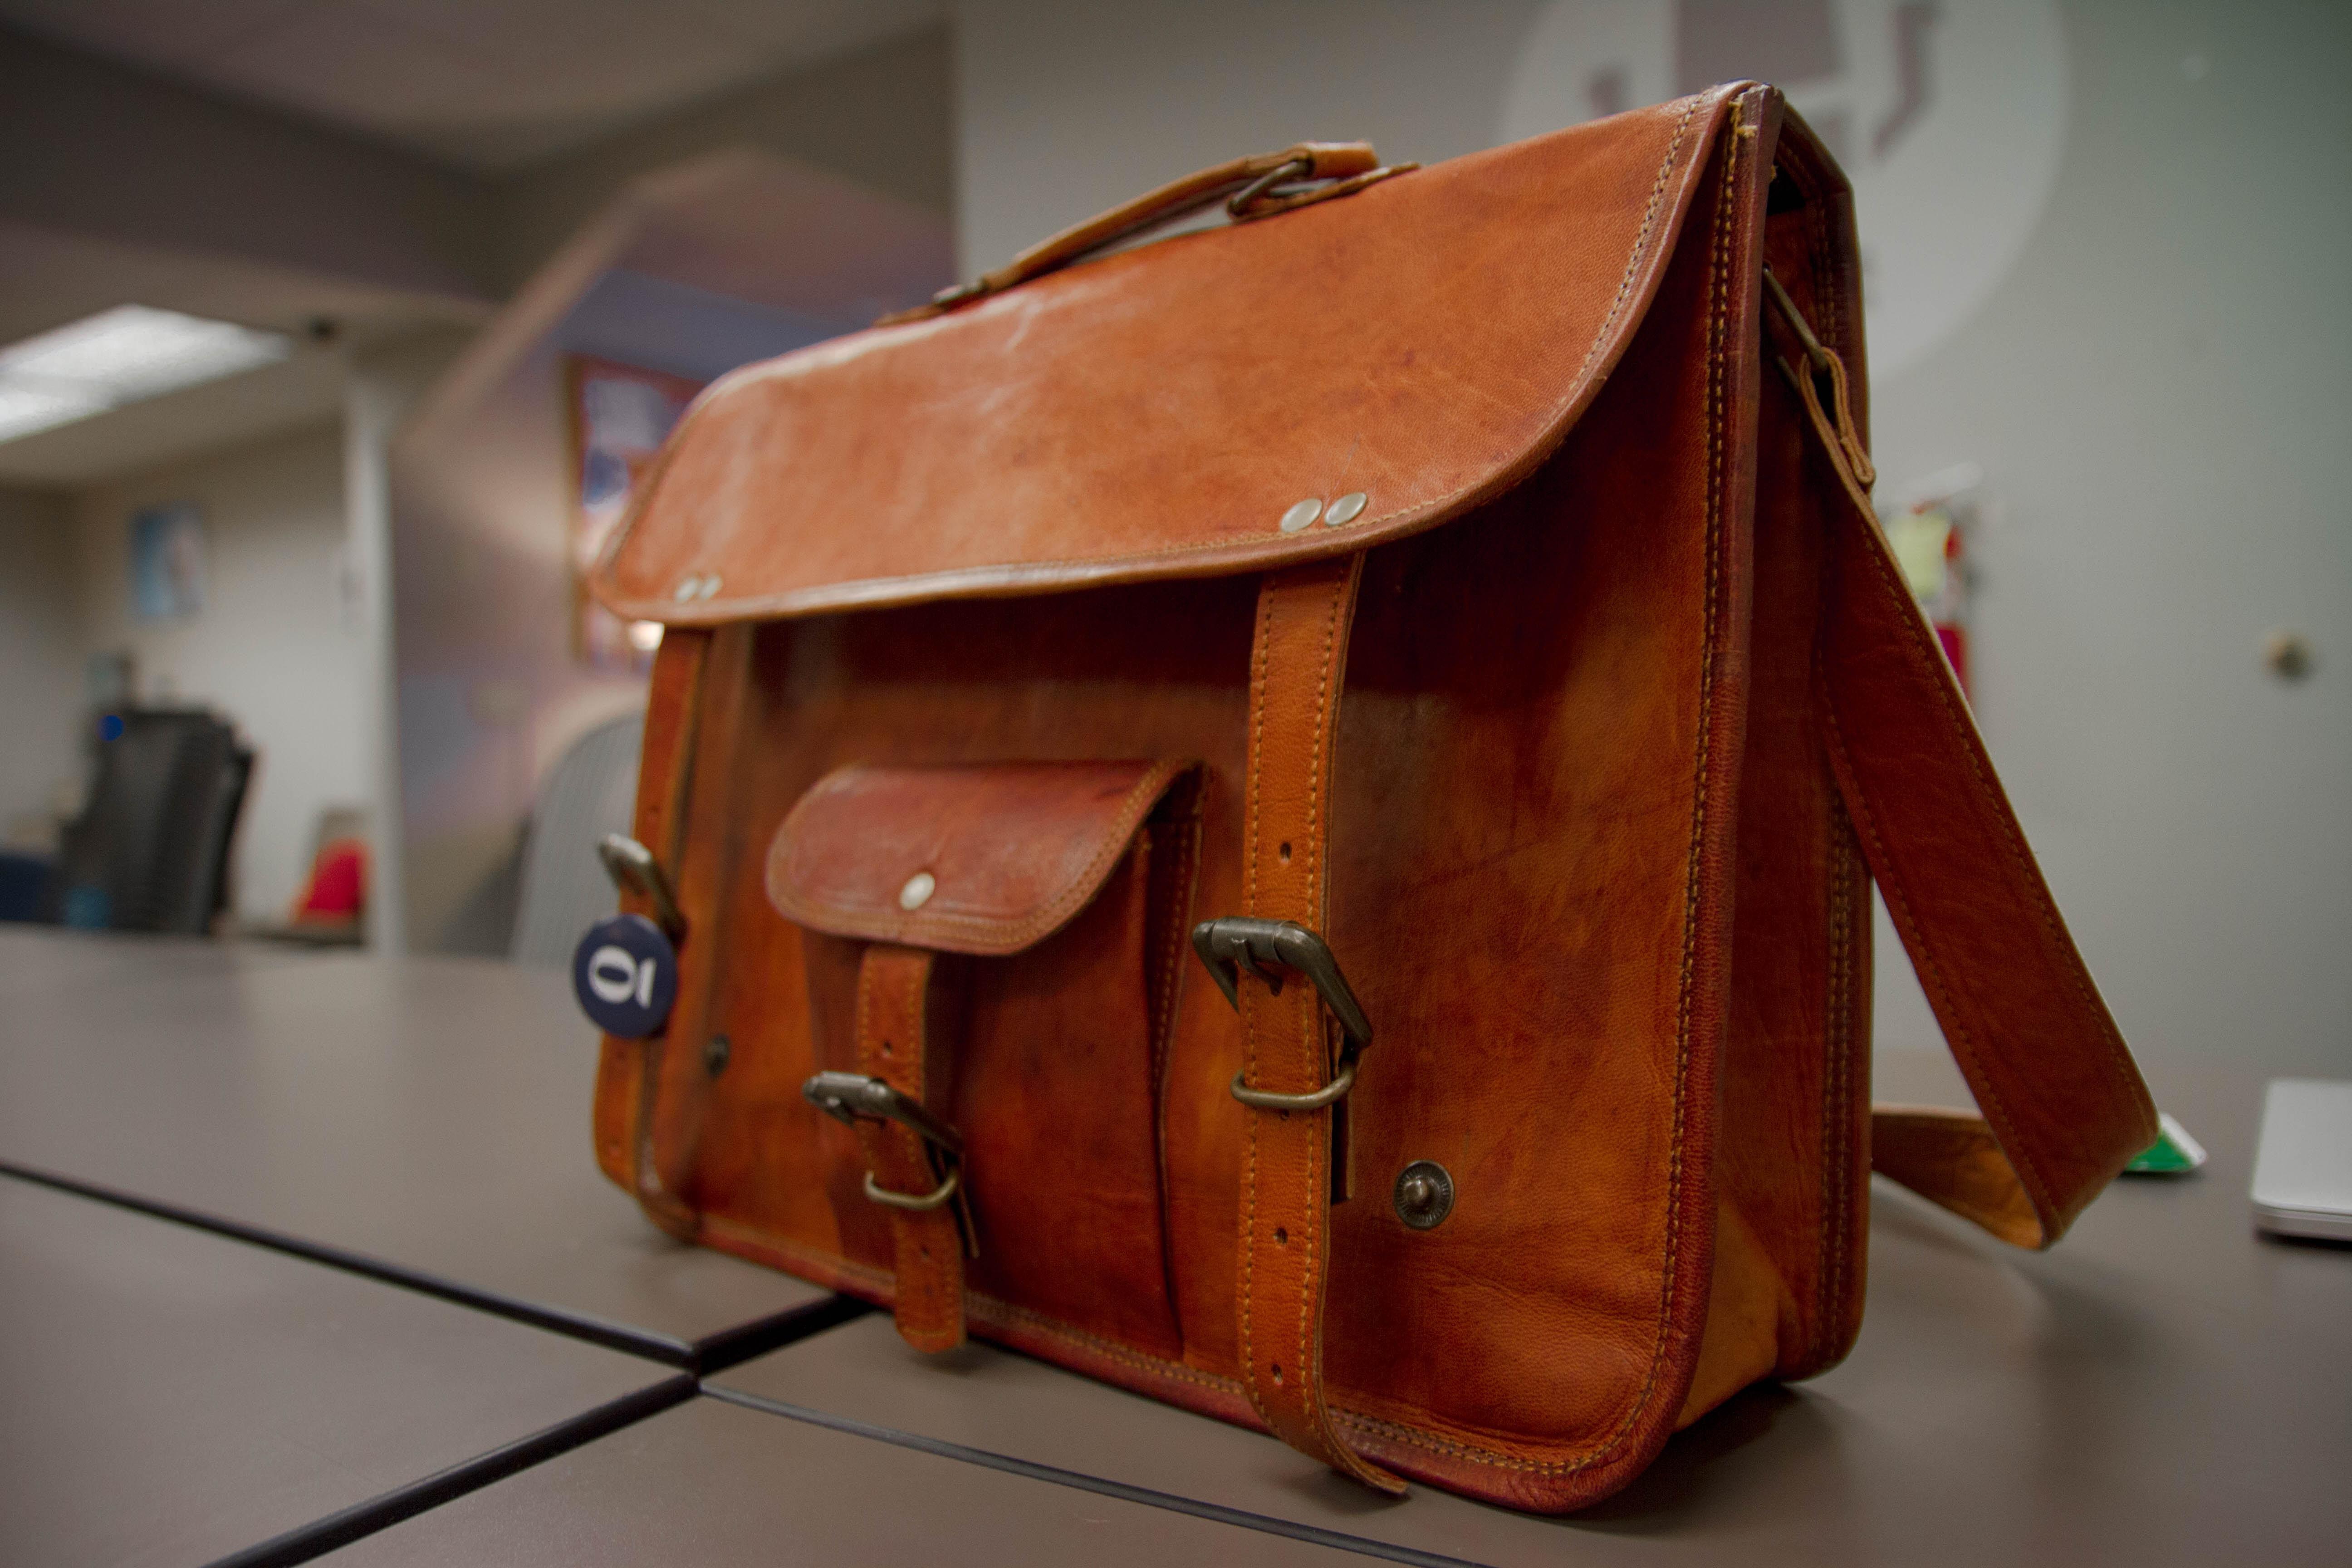 closeup photo of brown leather crossbody bag